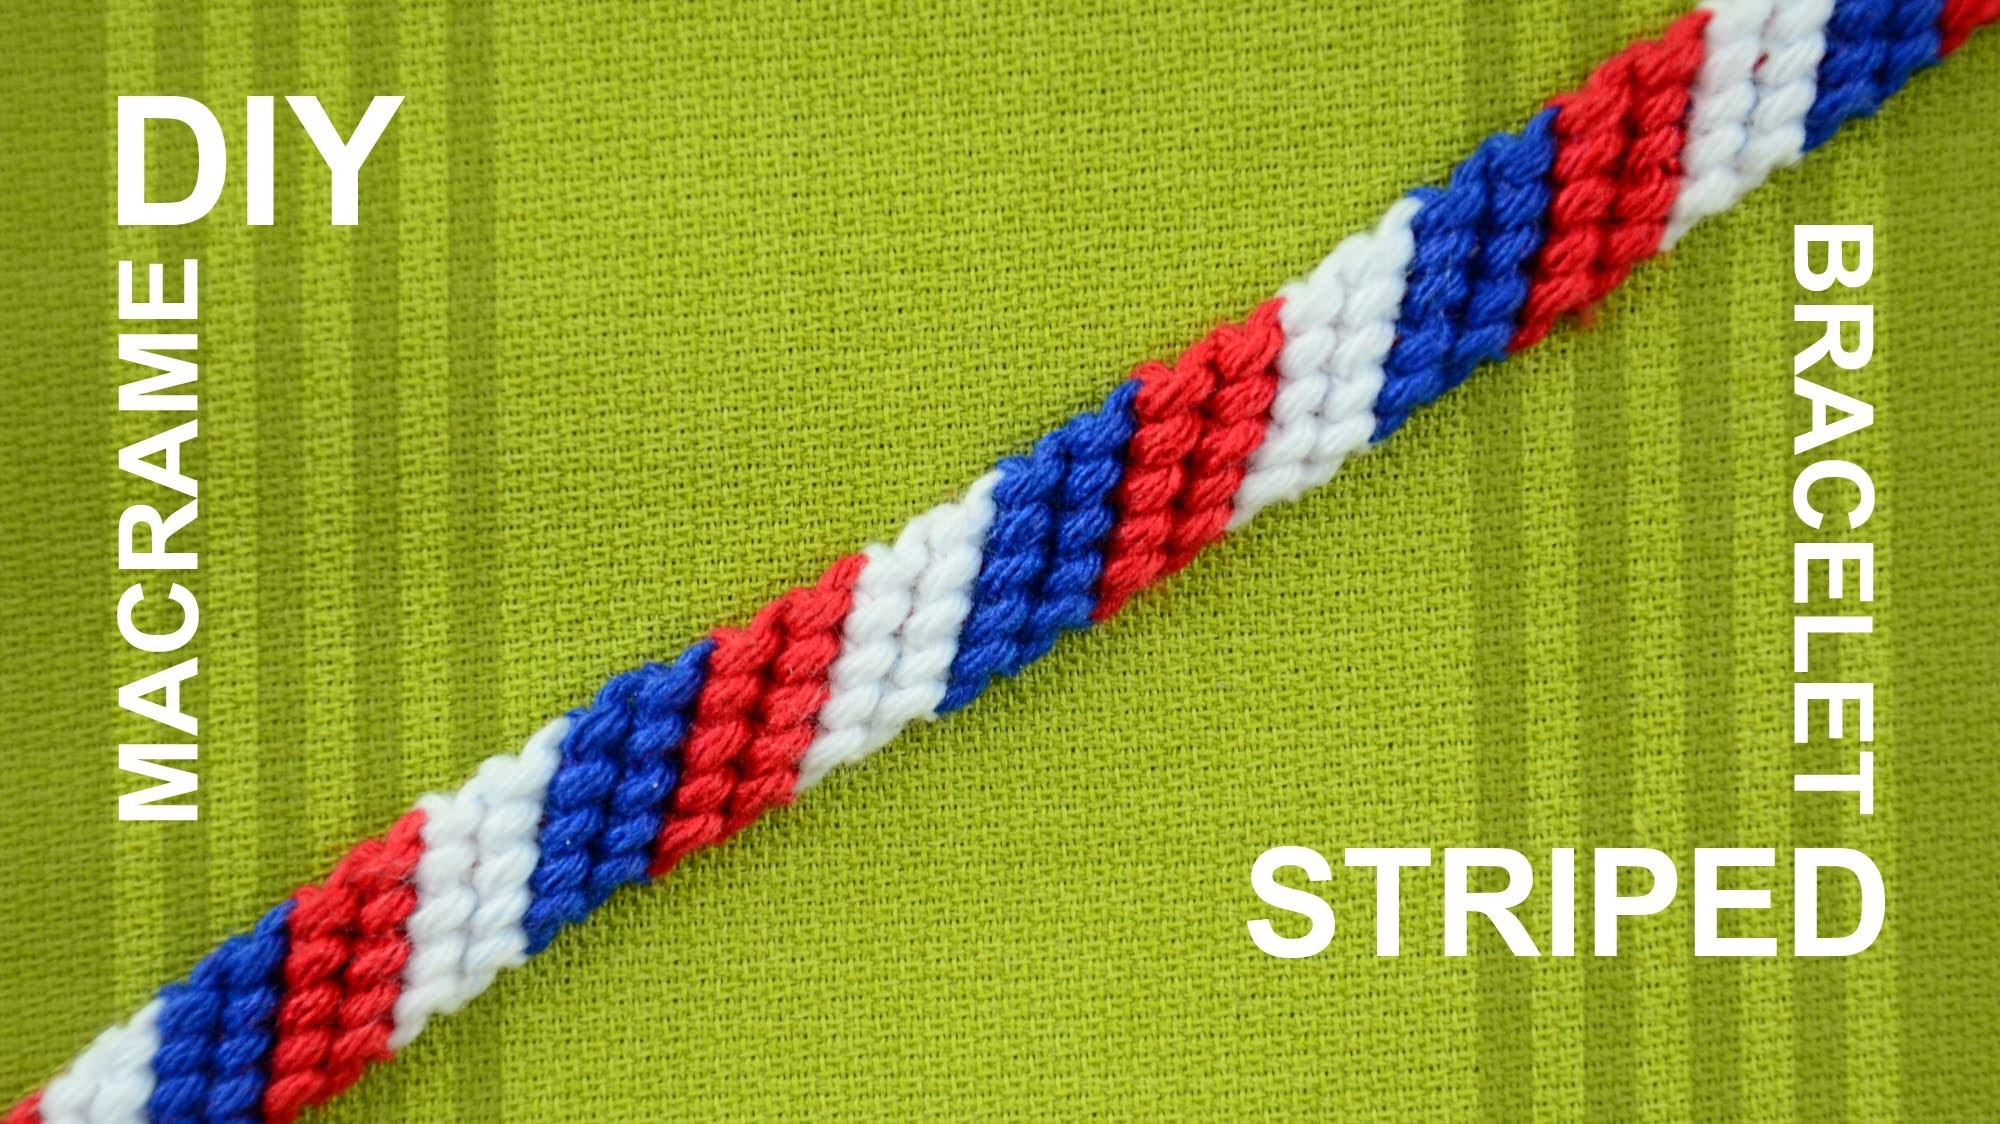 How to Make a Candy Stripe. Diagonal Striped Friendship Bracelet. Beginner